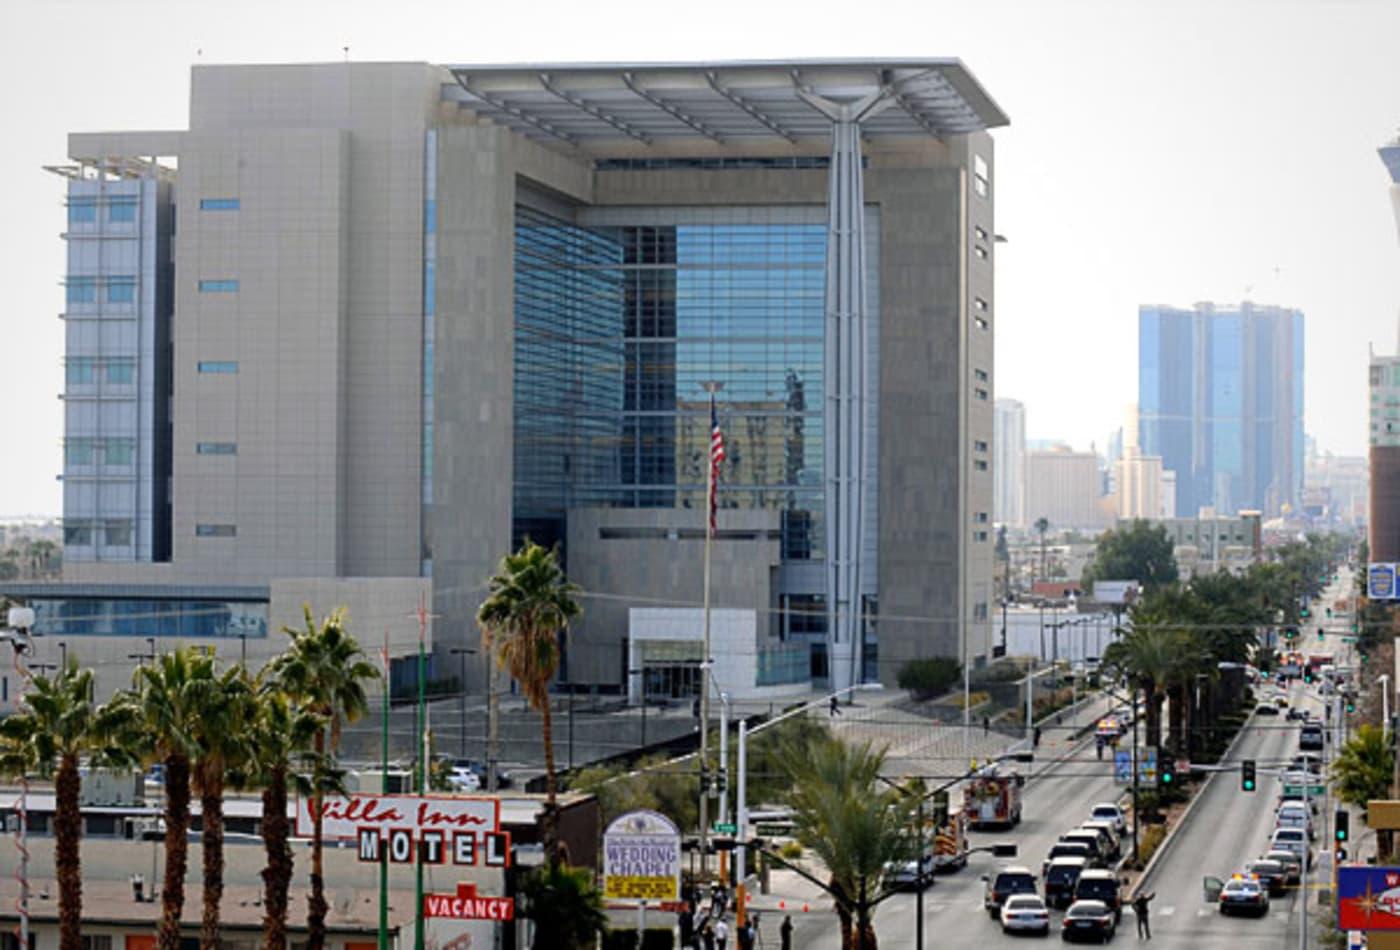 Las-Vegas-Most-Stressful-Cities-CNBC.jpg